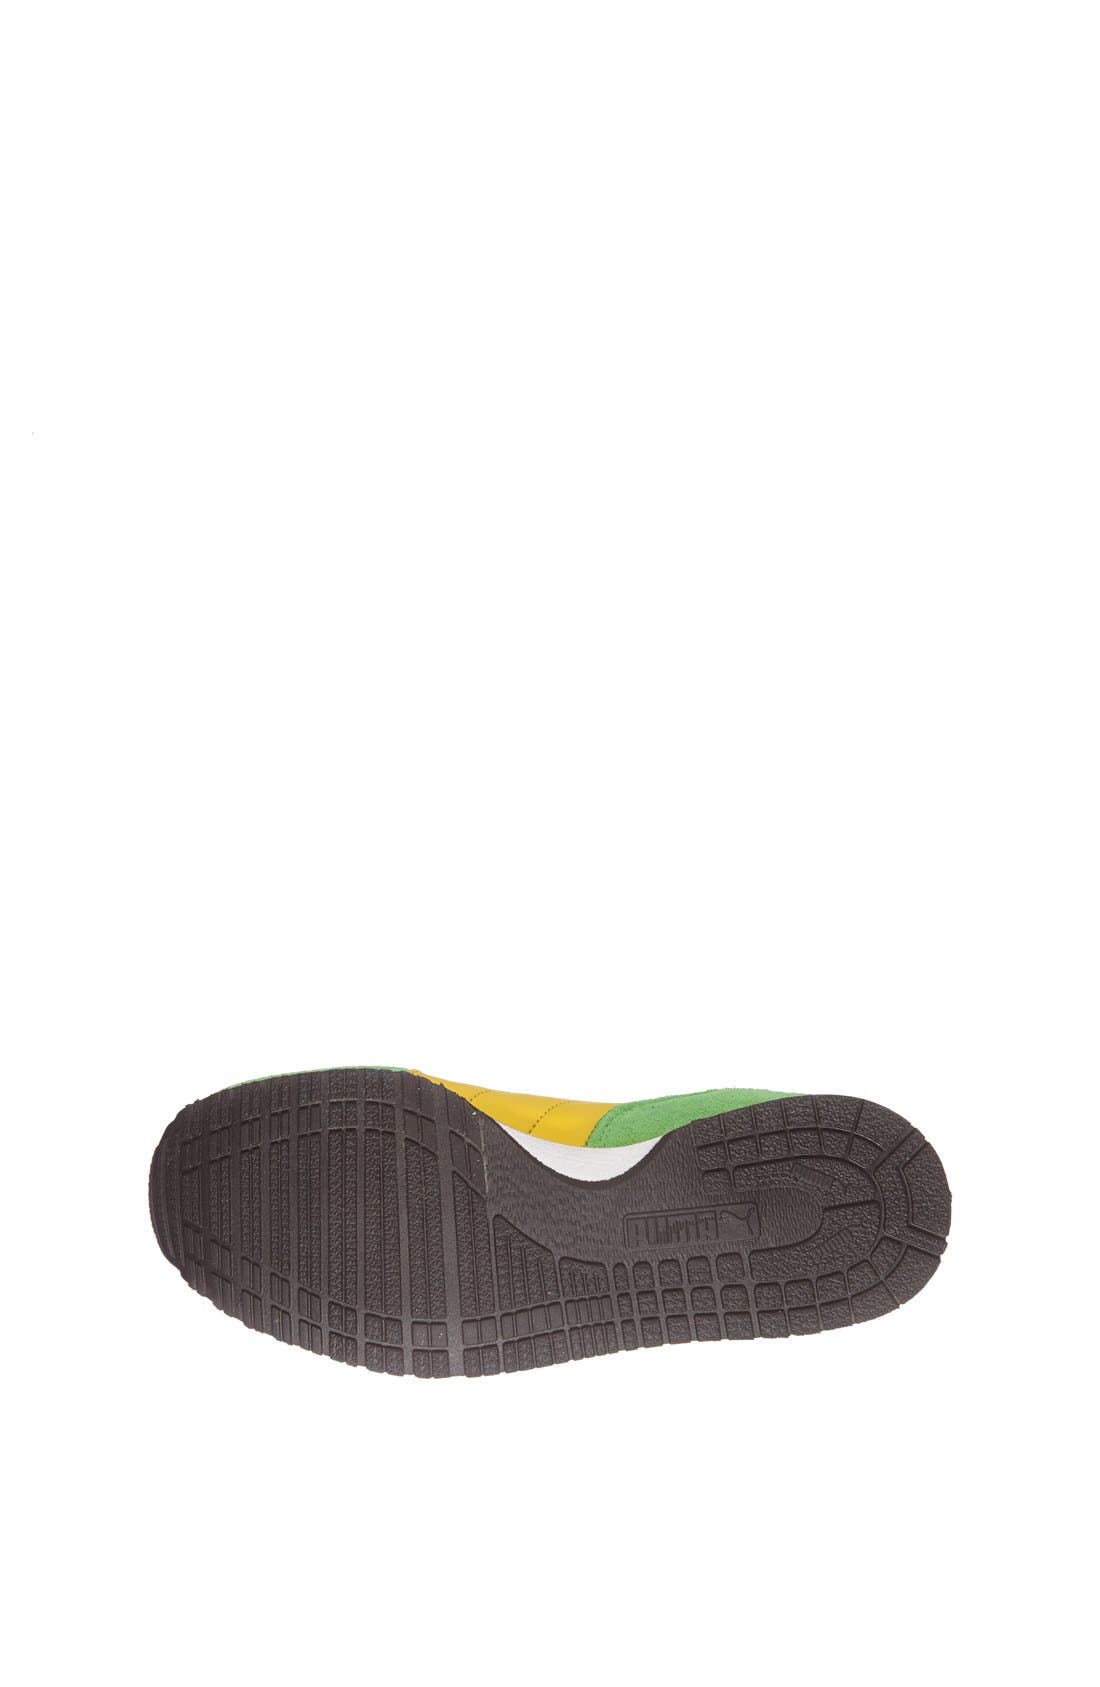 Alternate Image 4  - PUMA 'Cabana Racer' Running Shoe (Toddler, Little Kid & Big Kid)